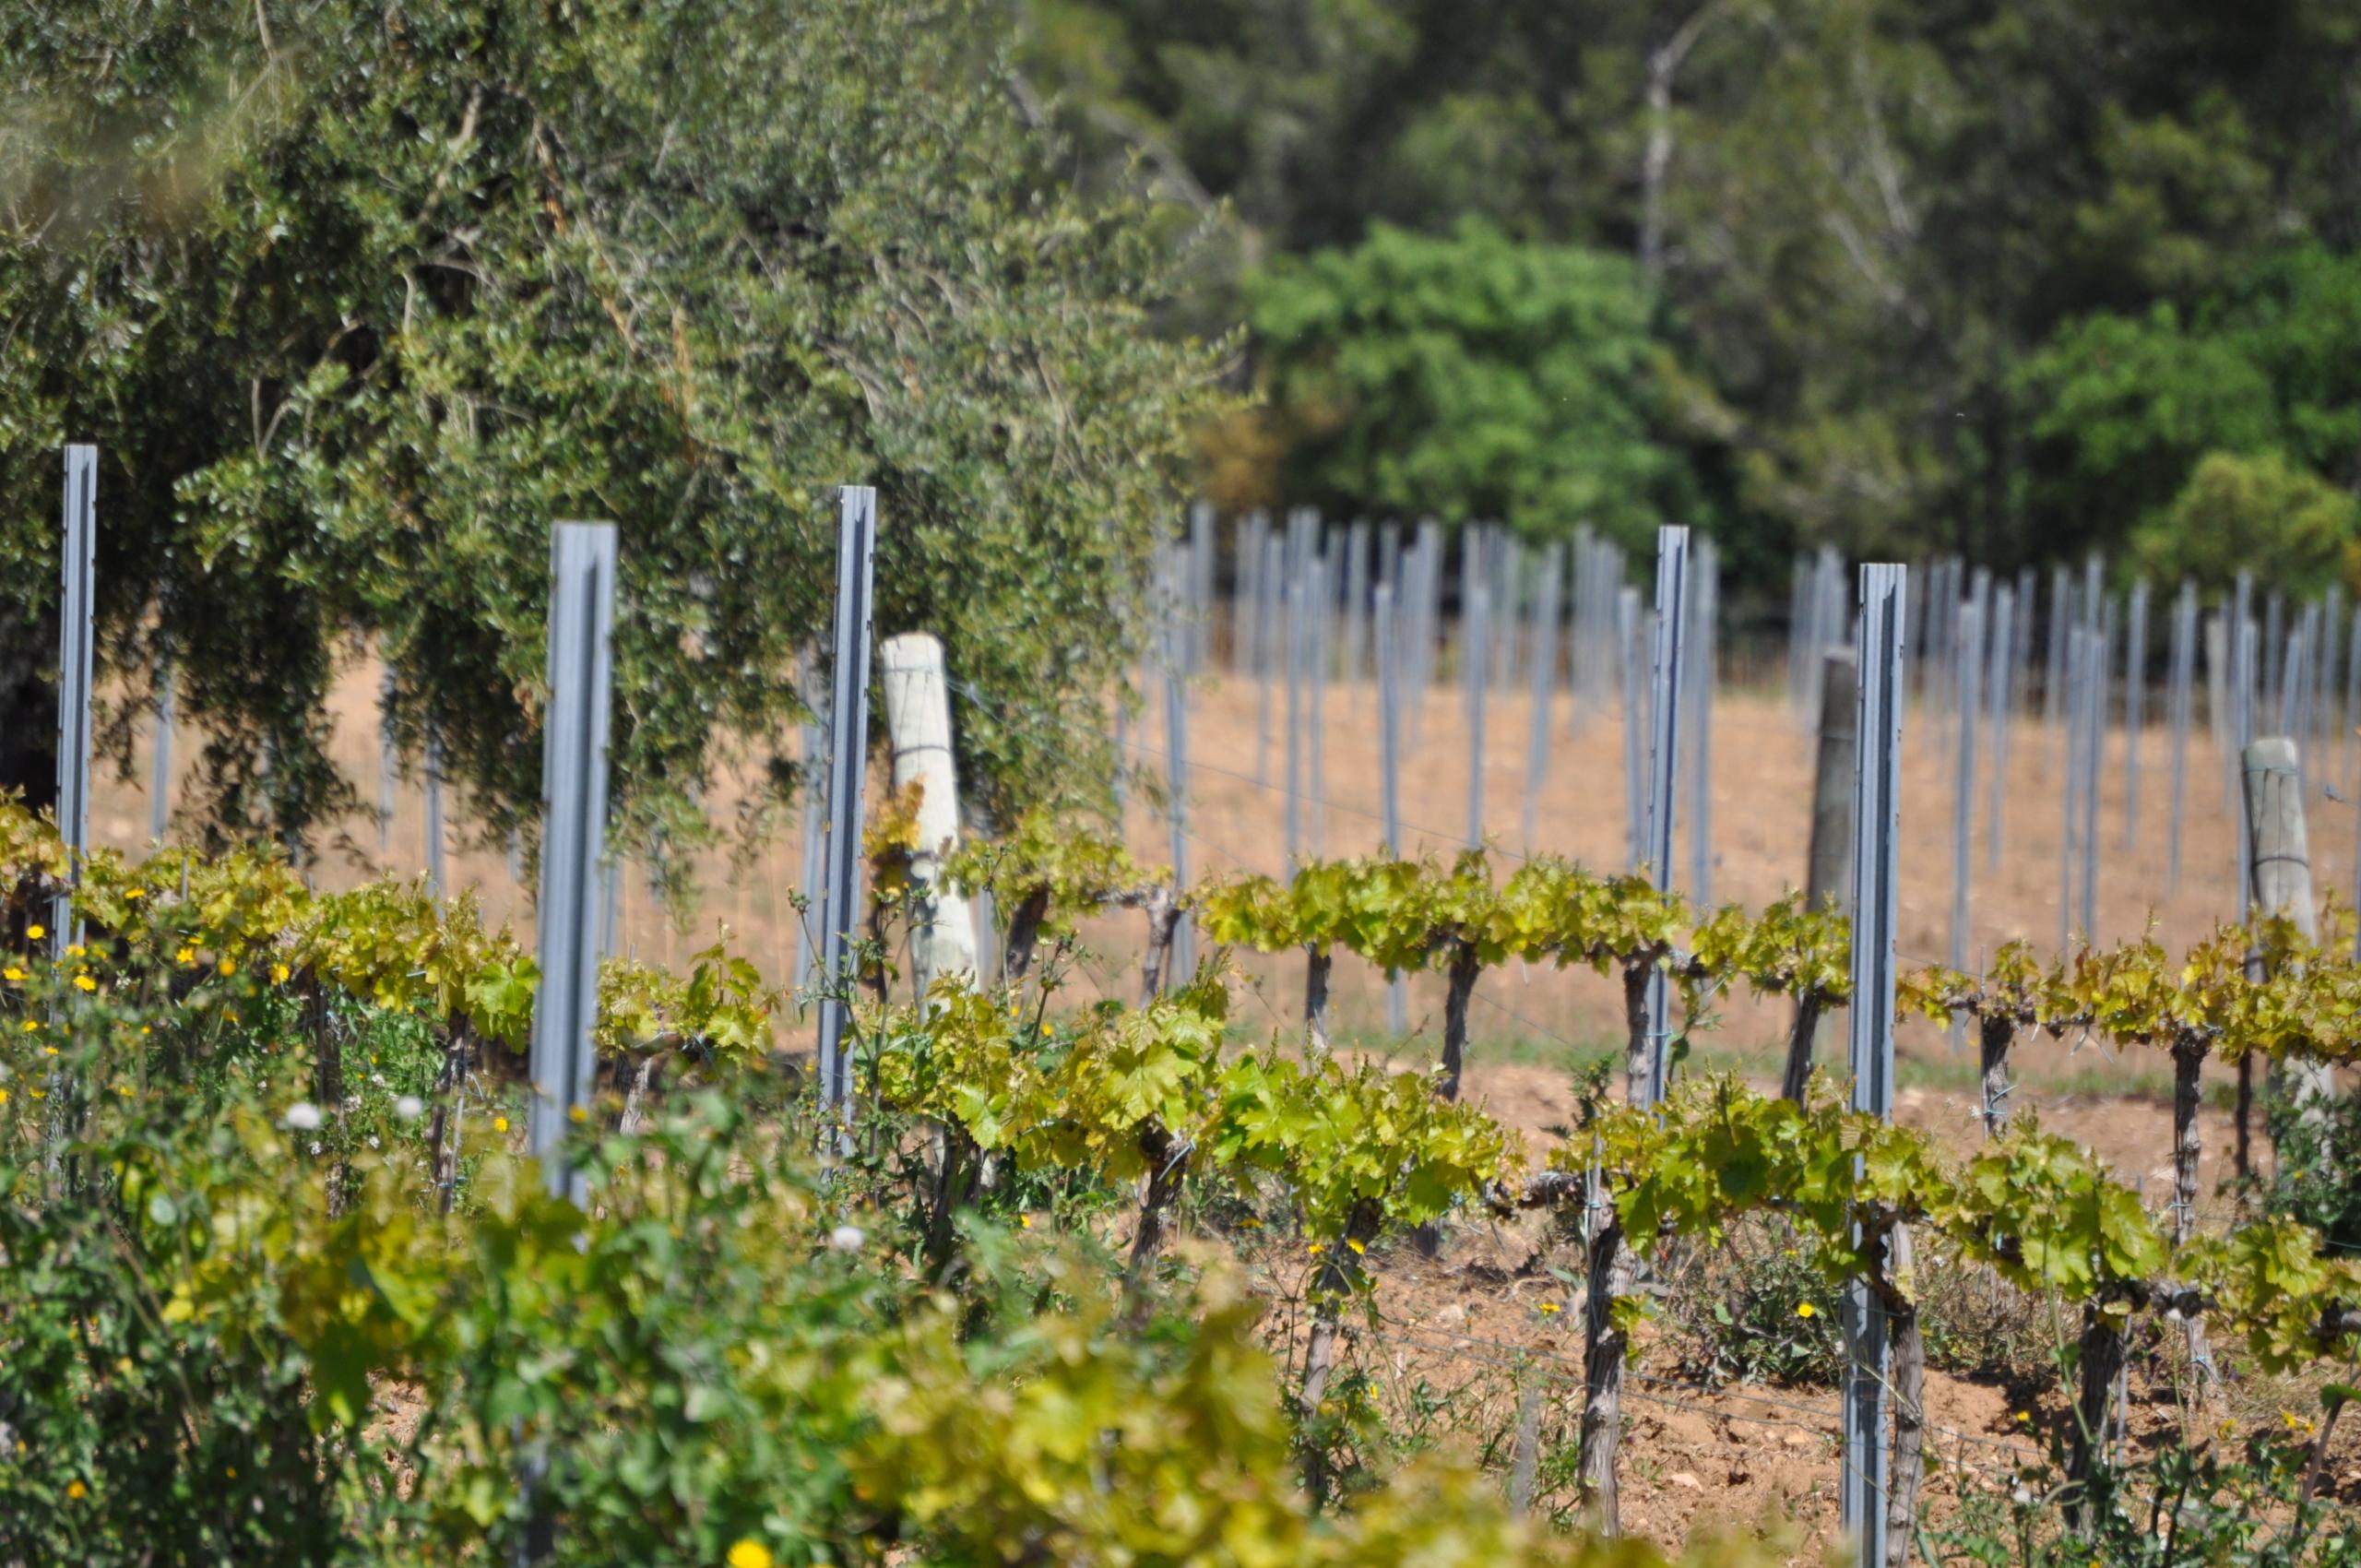 Paisatge agroforestal al Penedès | Soazig Darnay